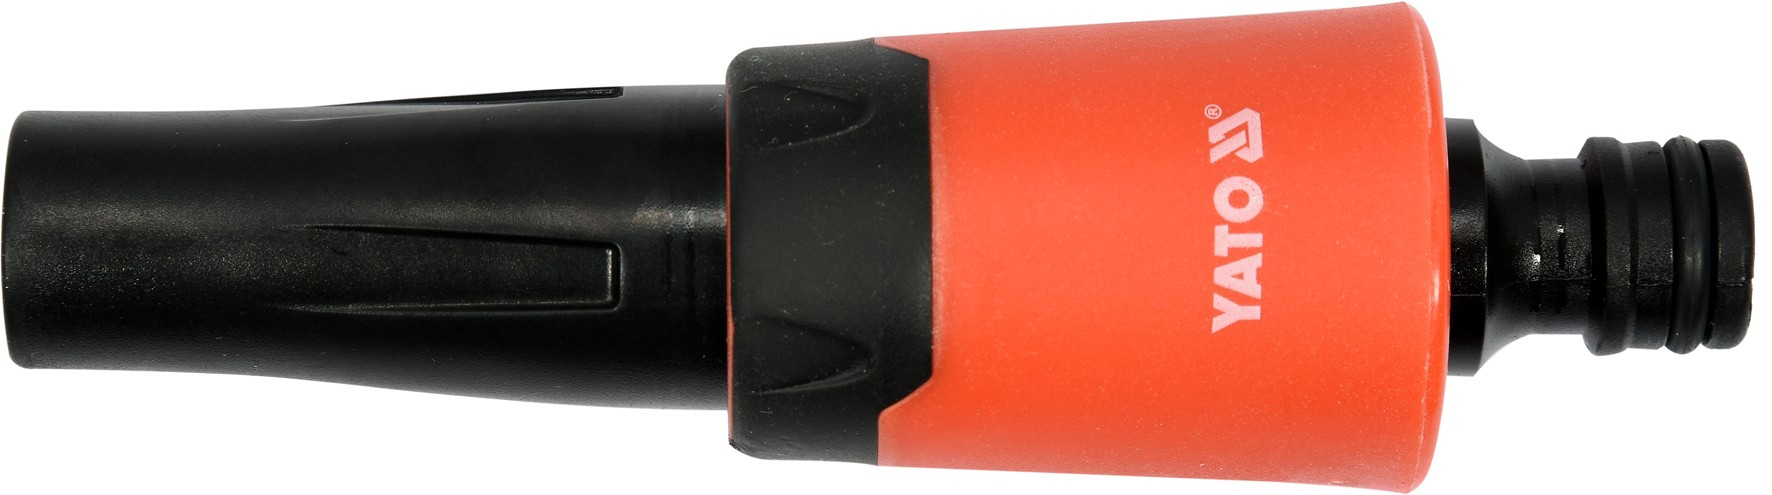 "Tryska postřikovací 1/2""(12,5mm),ABS plast"